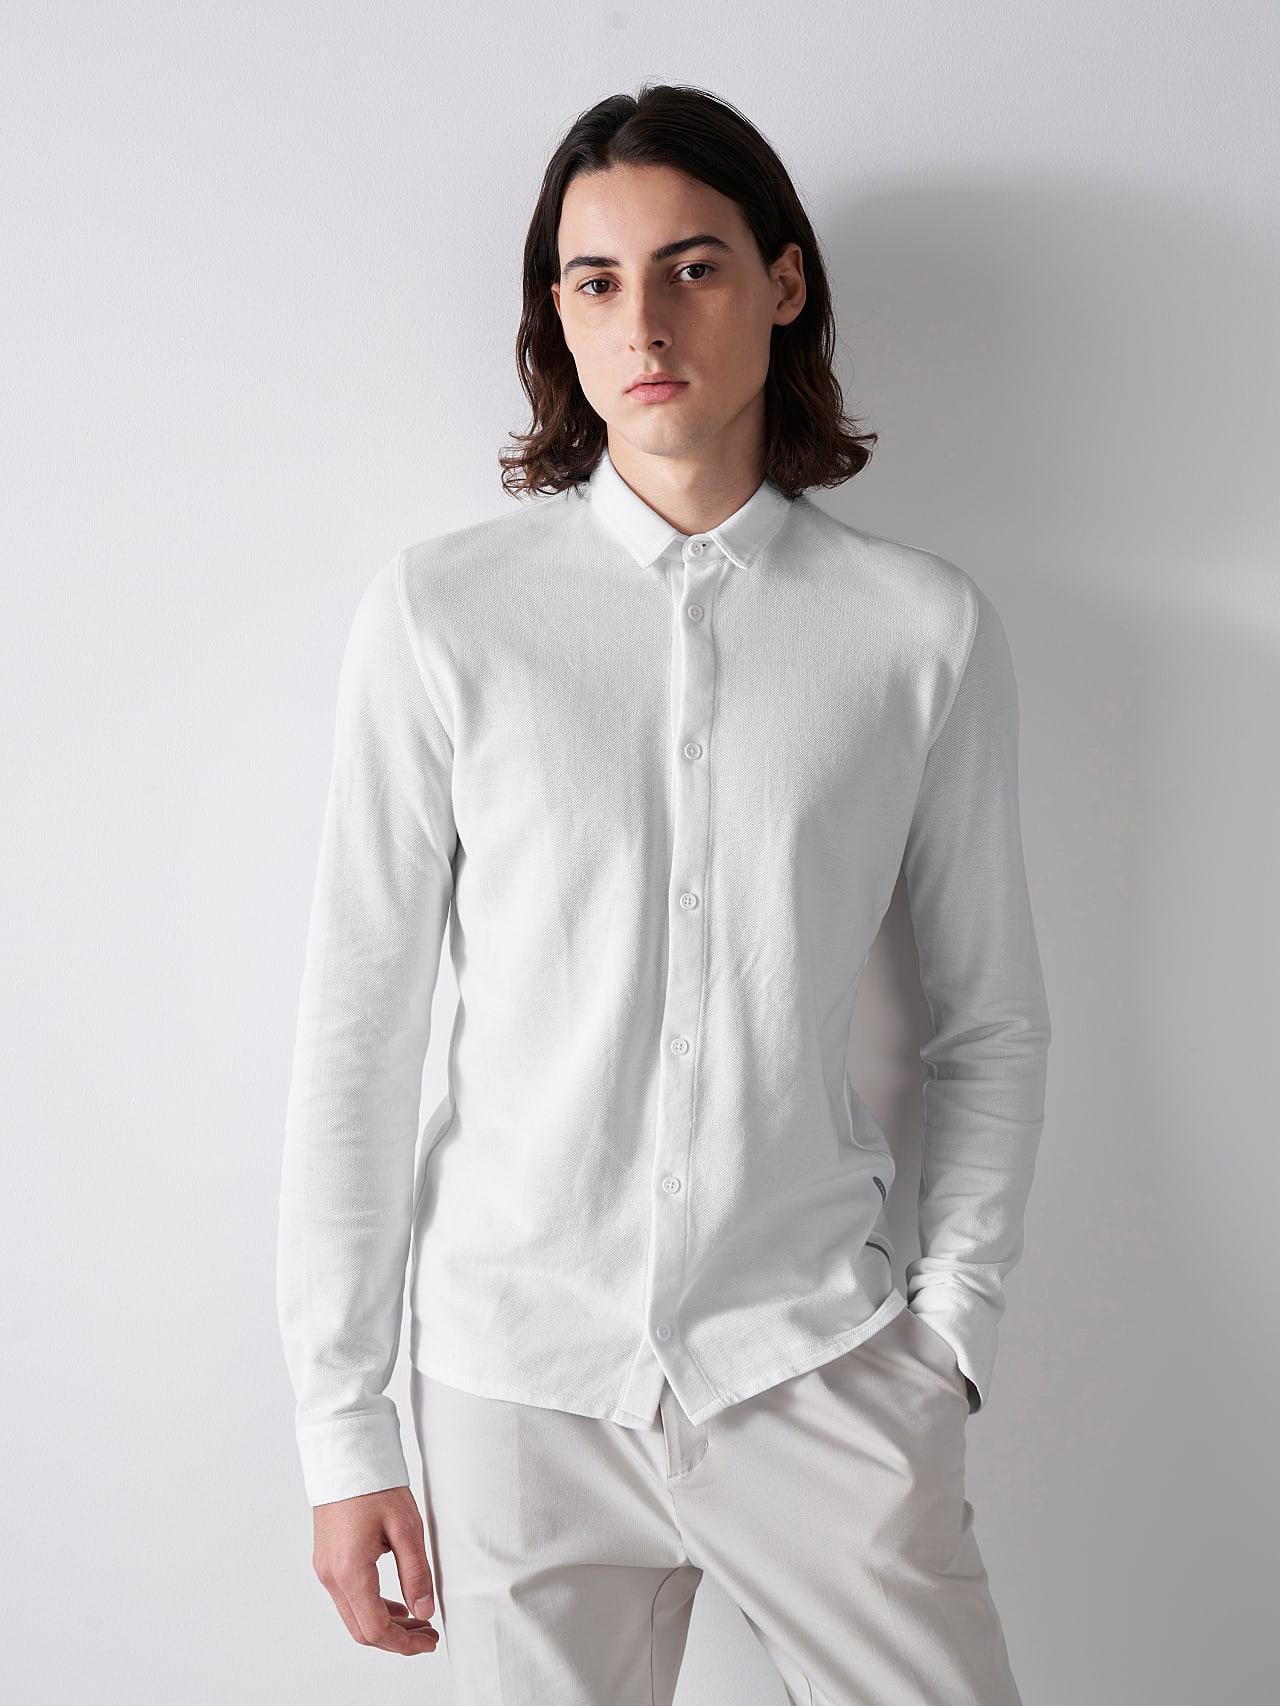 JIQUE V1.Y5.01 Pique Shirt with Kent Collar white Model shot Alpha Tauri